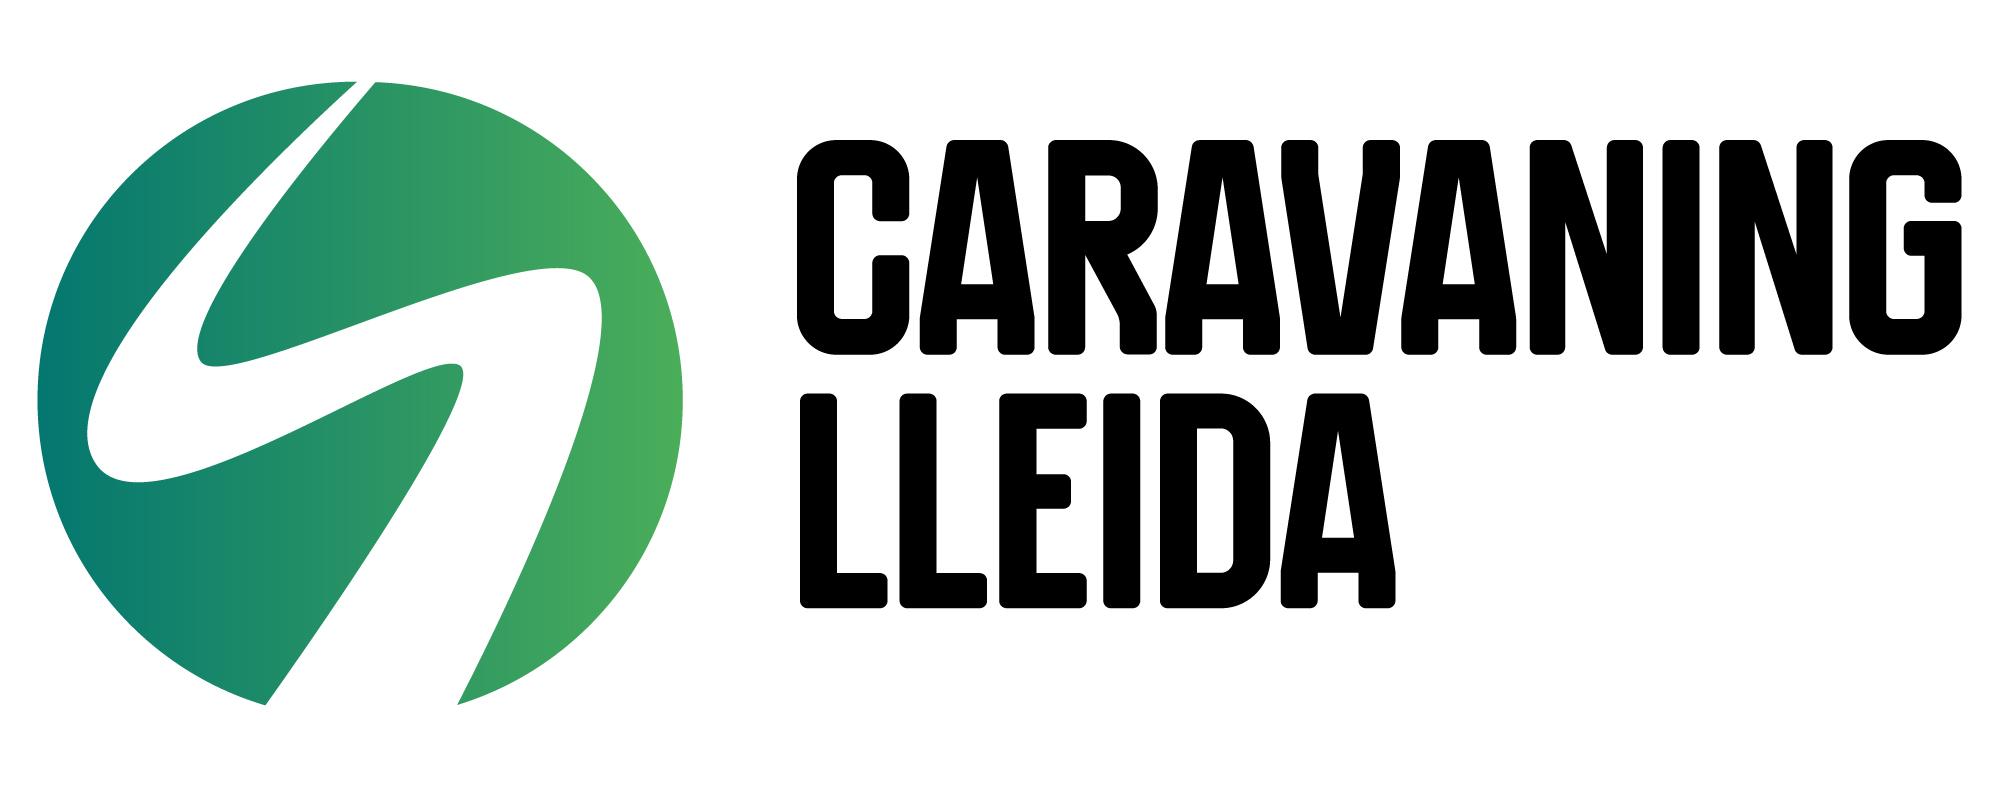 Caravaning Lleida